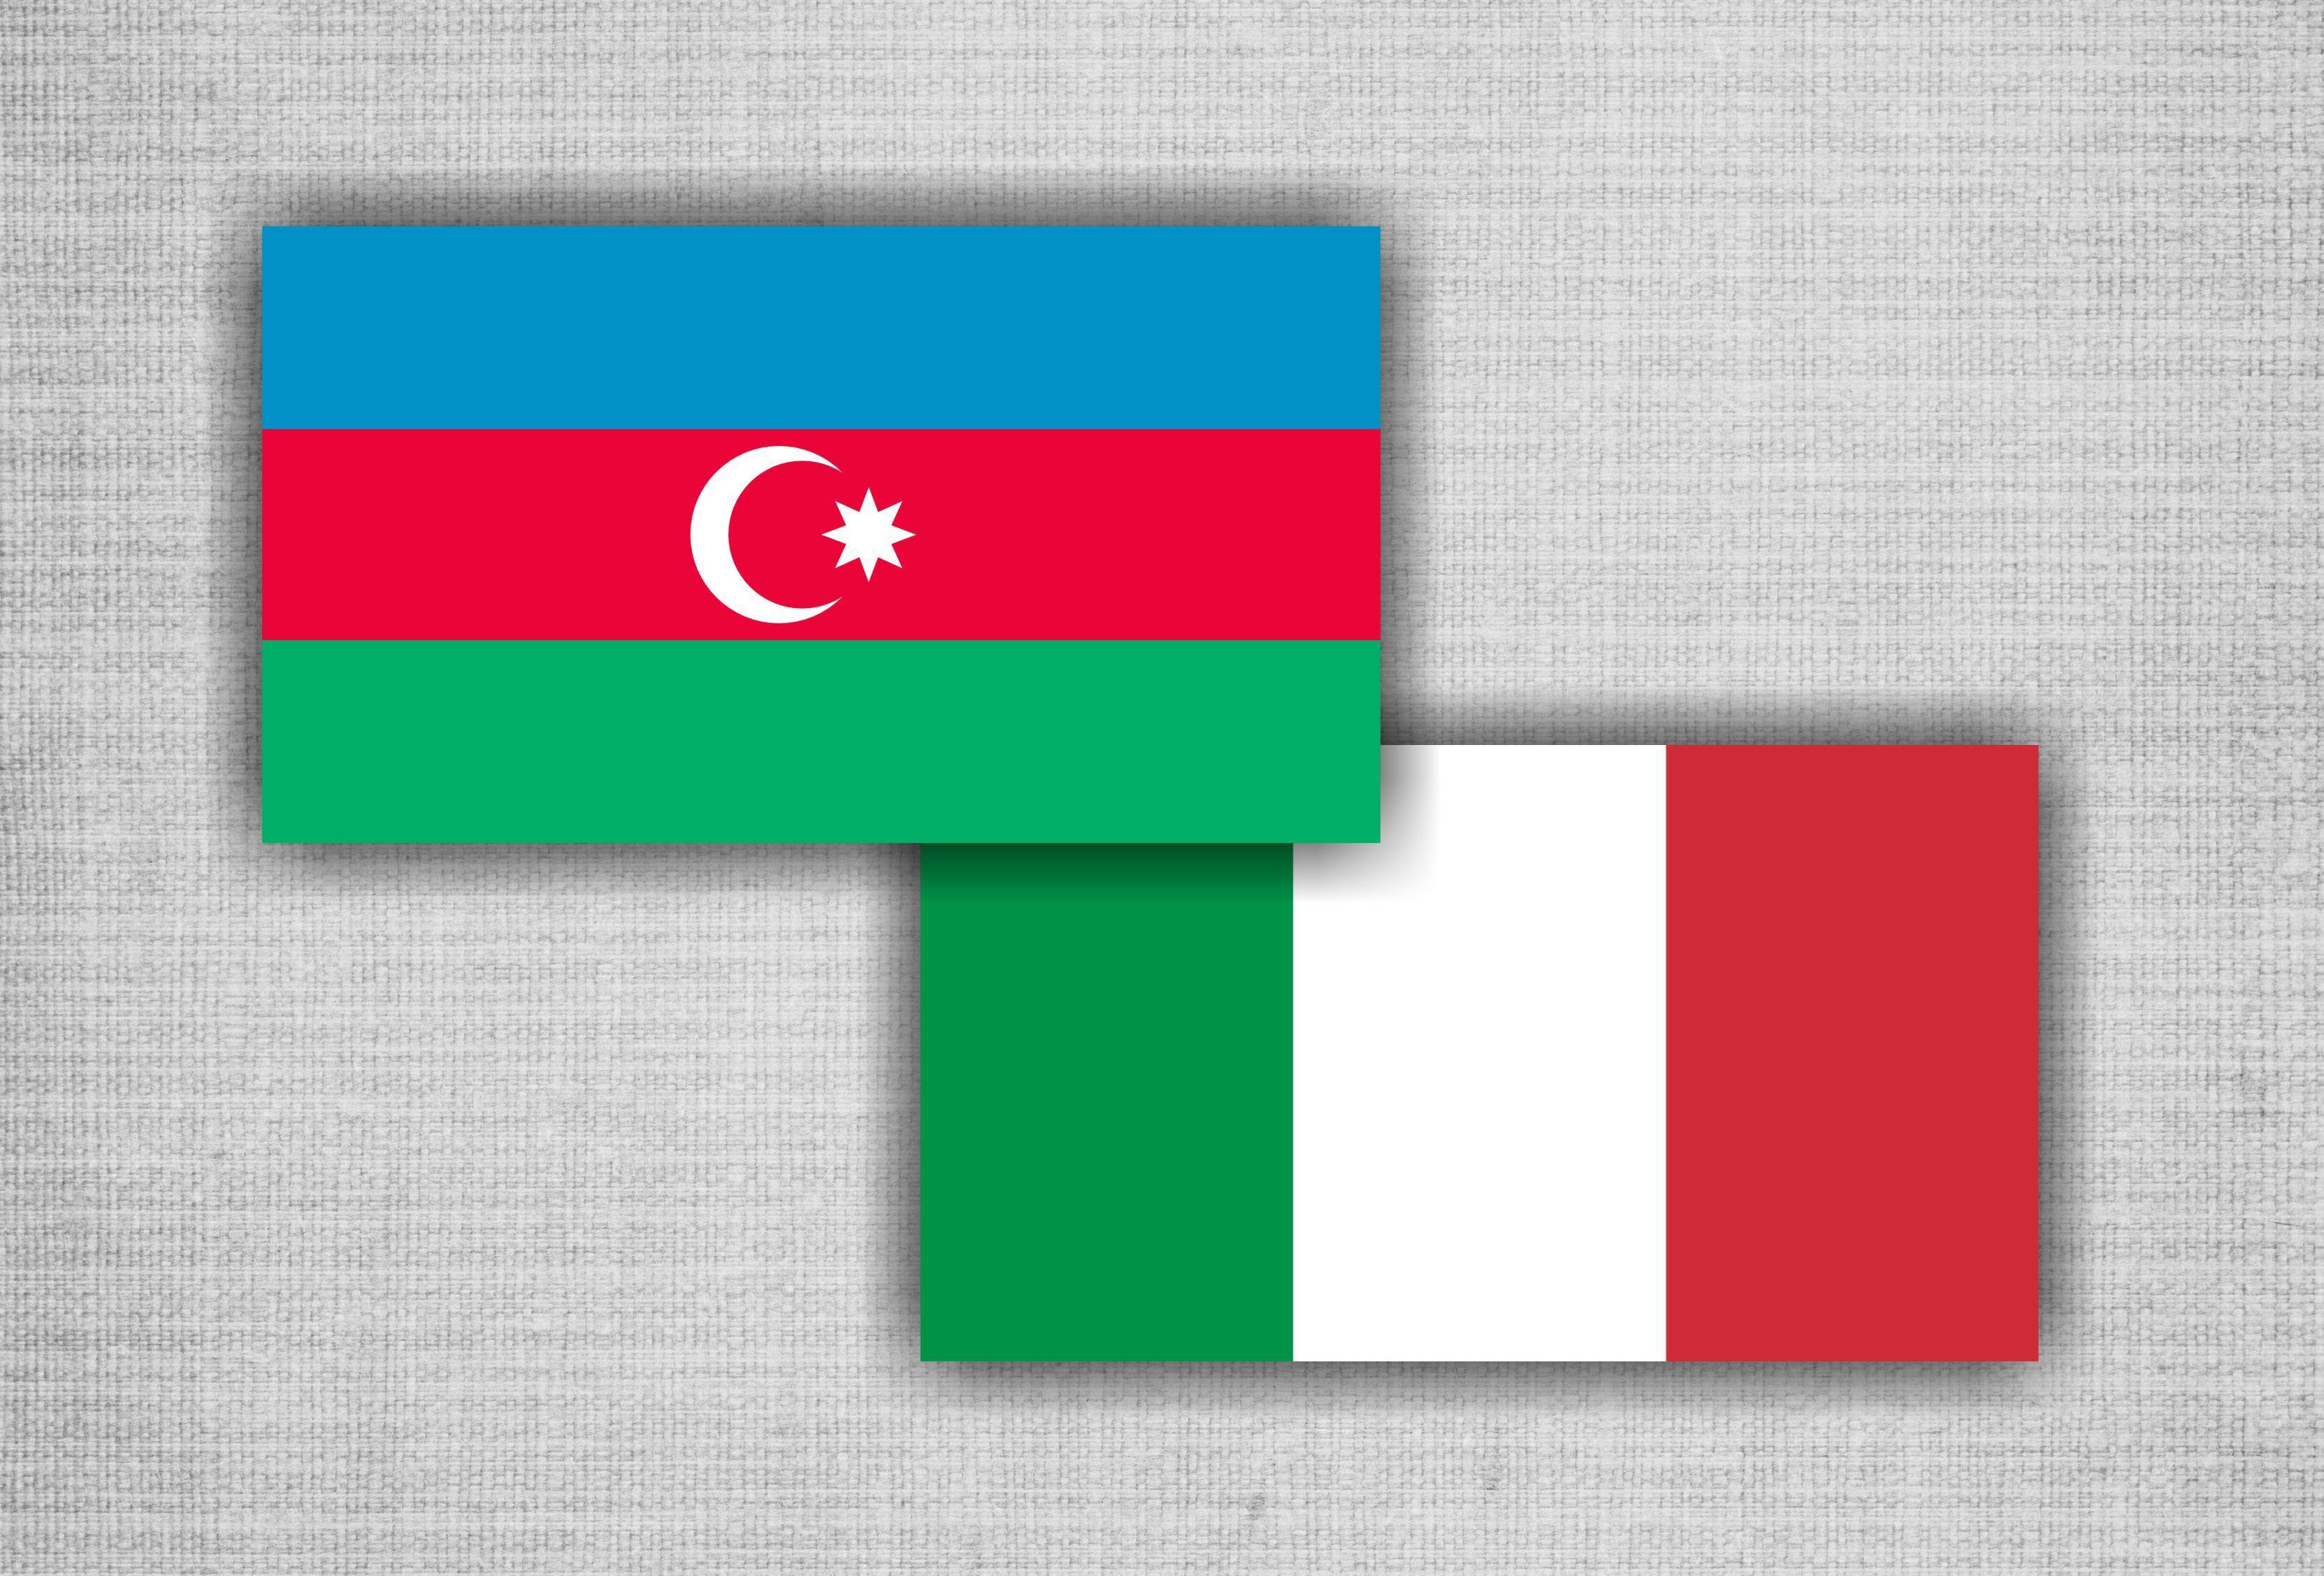 Italian-Azerbaijani Cooperation and Friendship Community created